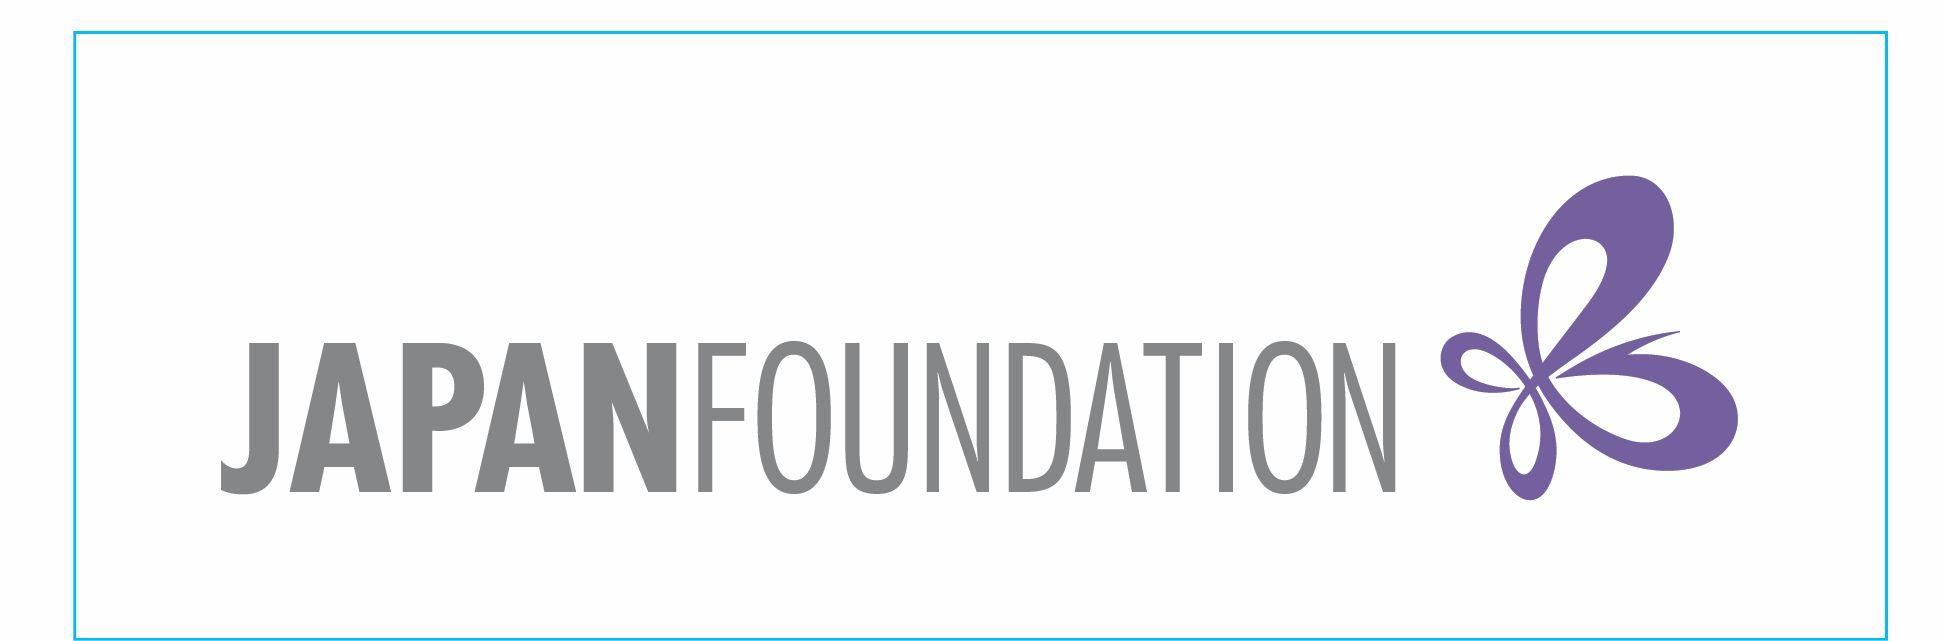 The Japan Foundation